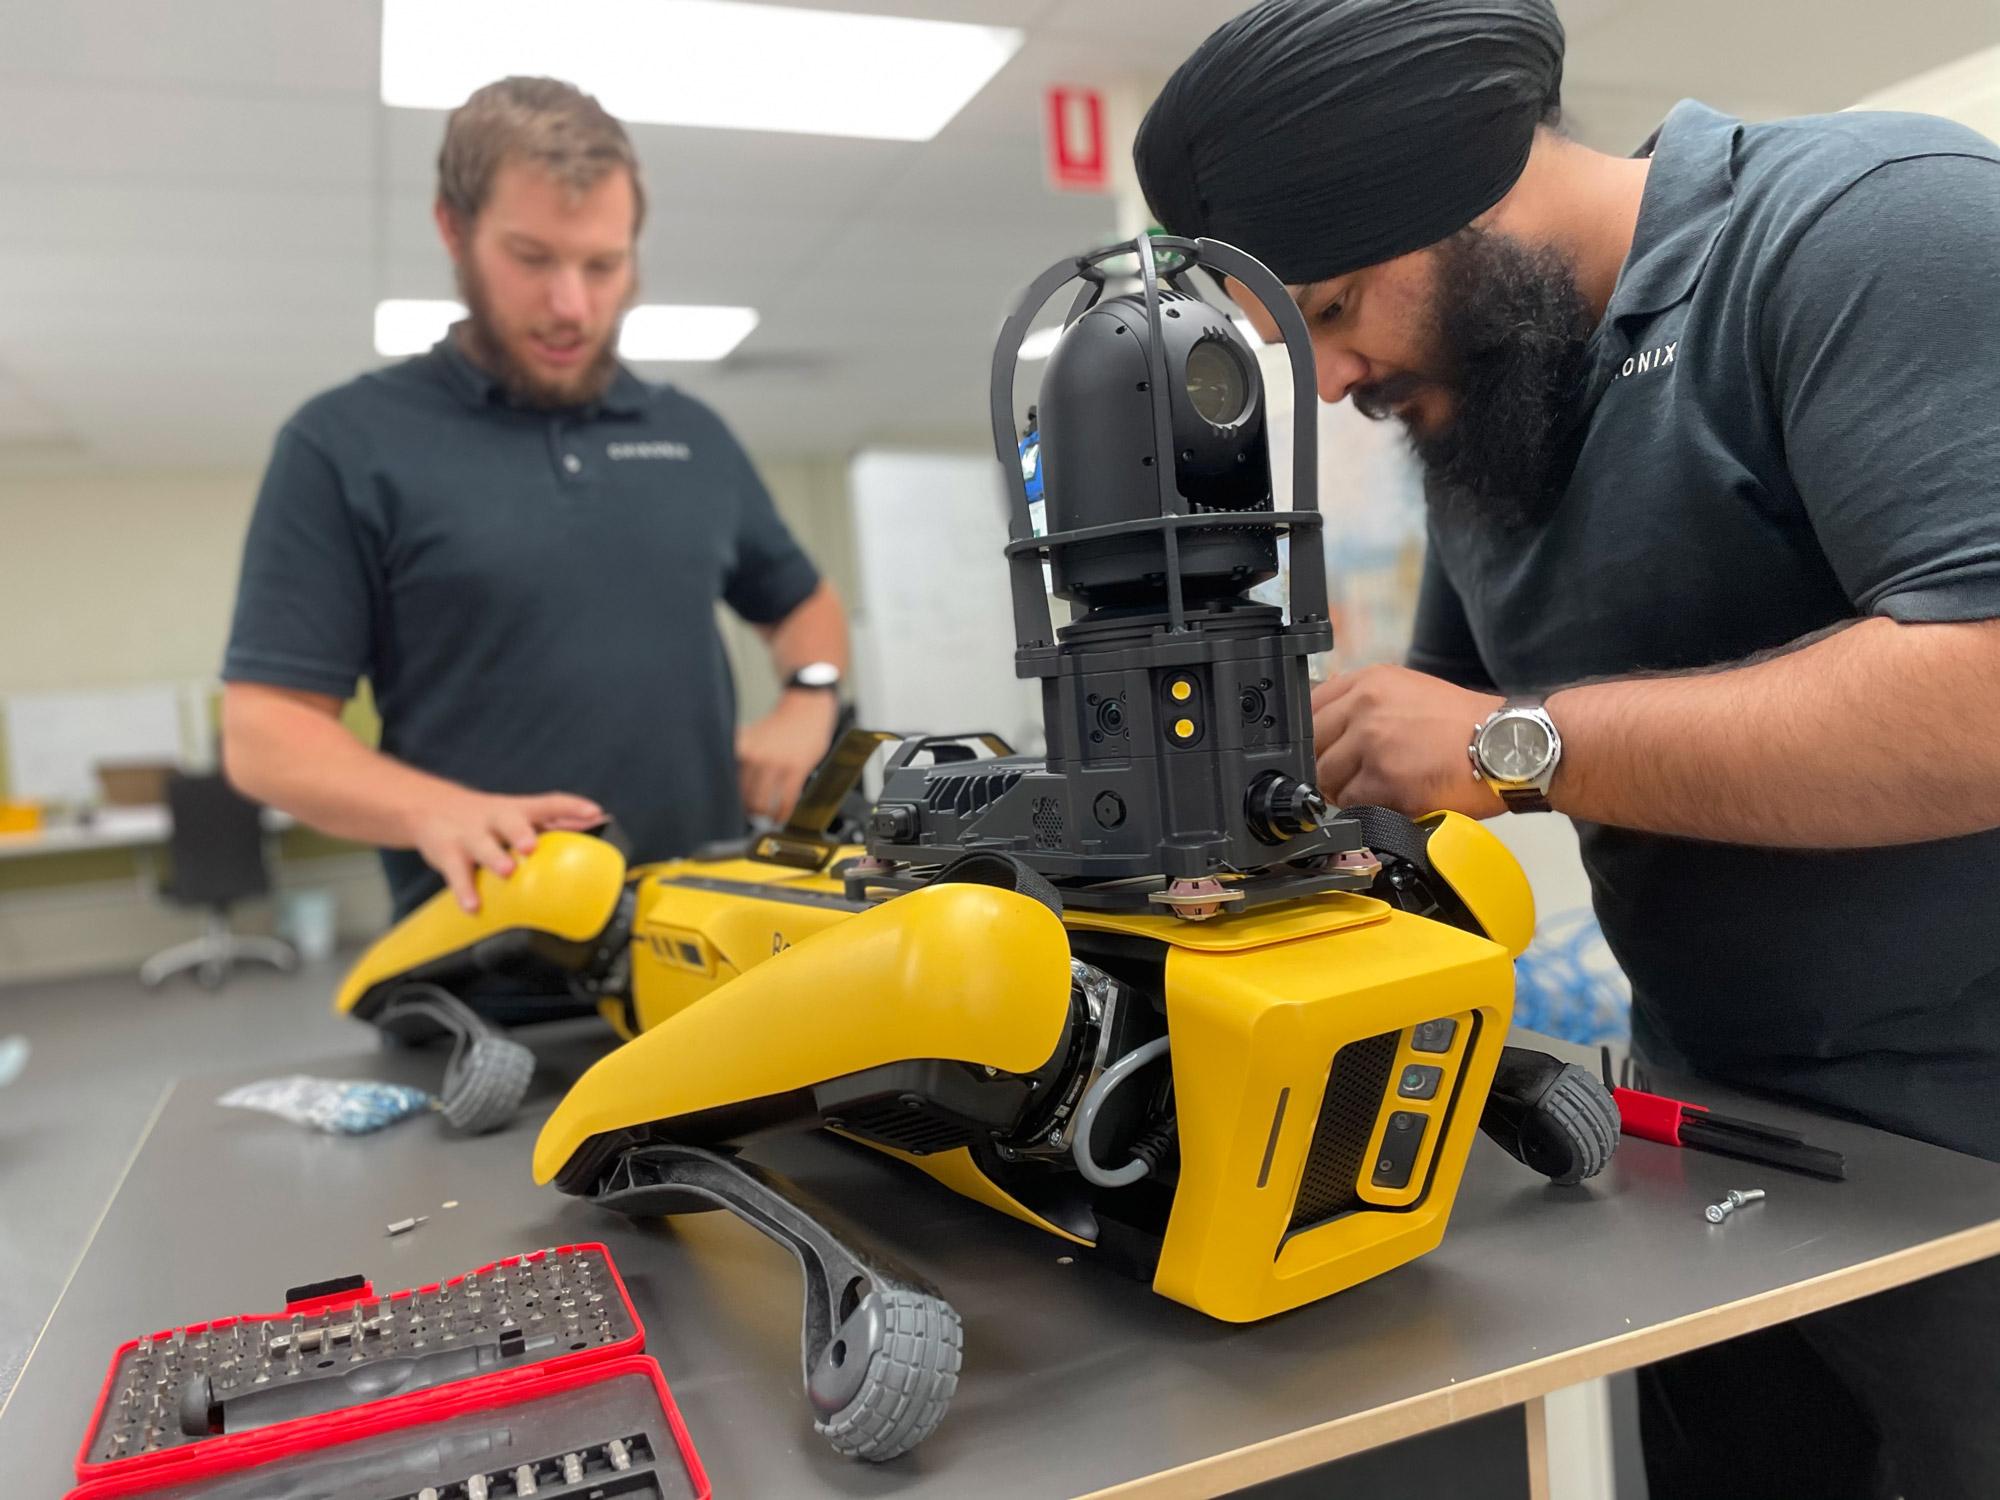 2 roboticists working on a spot robot